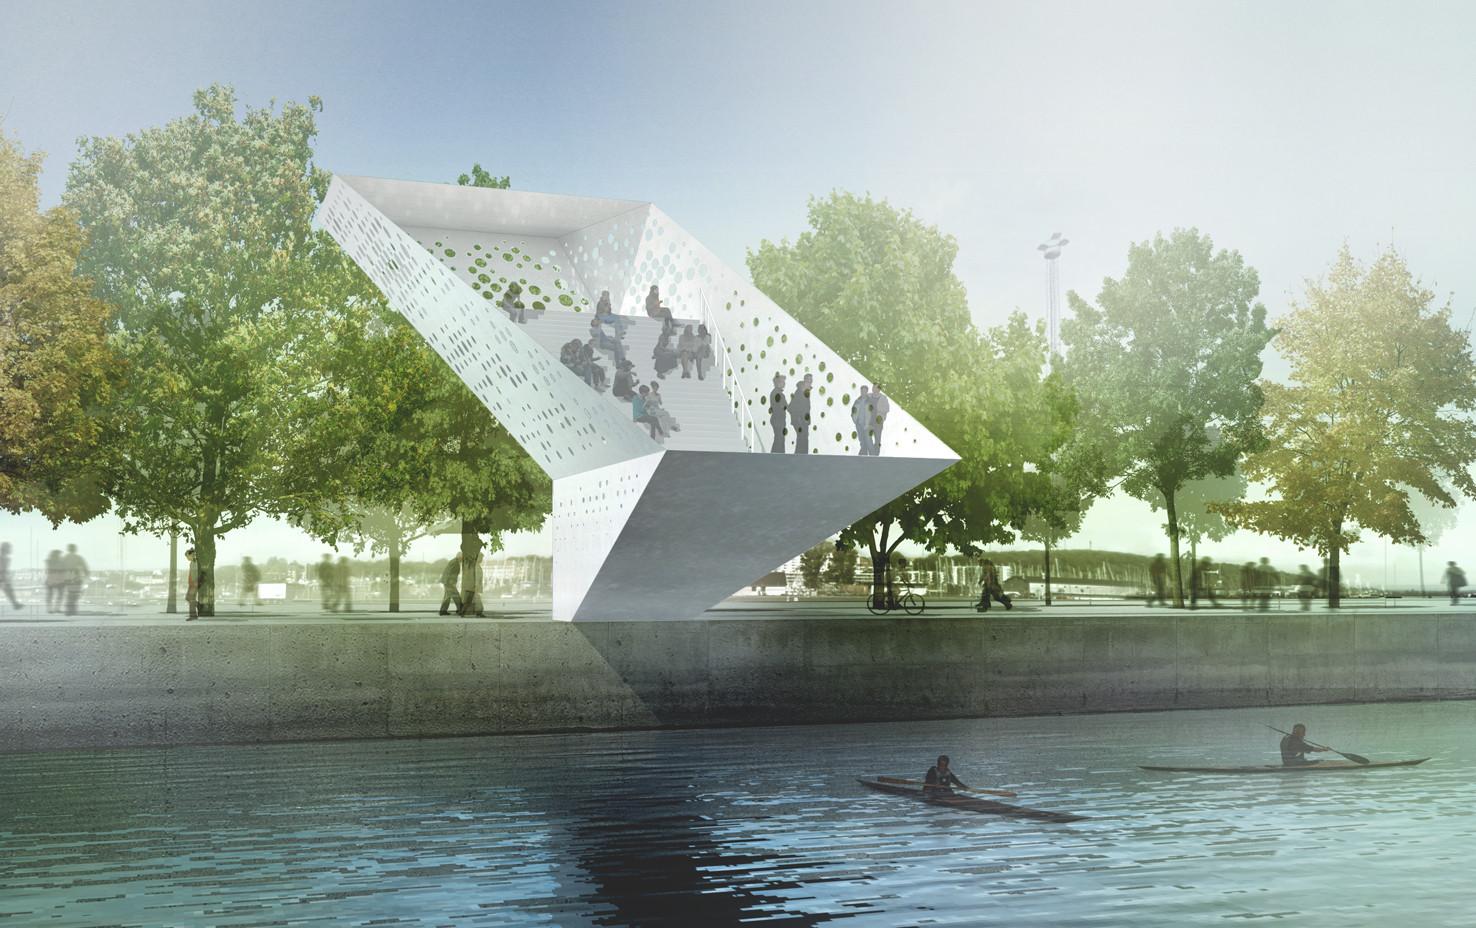 Dorte Mandrup Arkitekter Wins Competition to Design Landmark for Aarhus Harbour, Visualization. Image © Dorte Mandrup Arkitekter